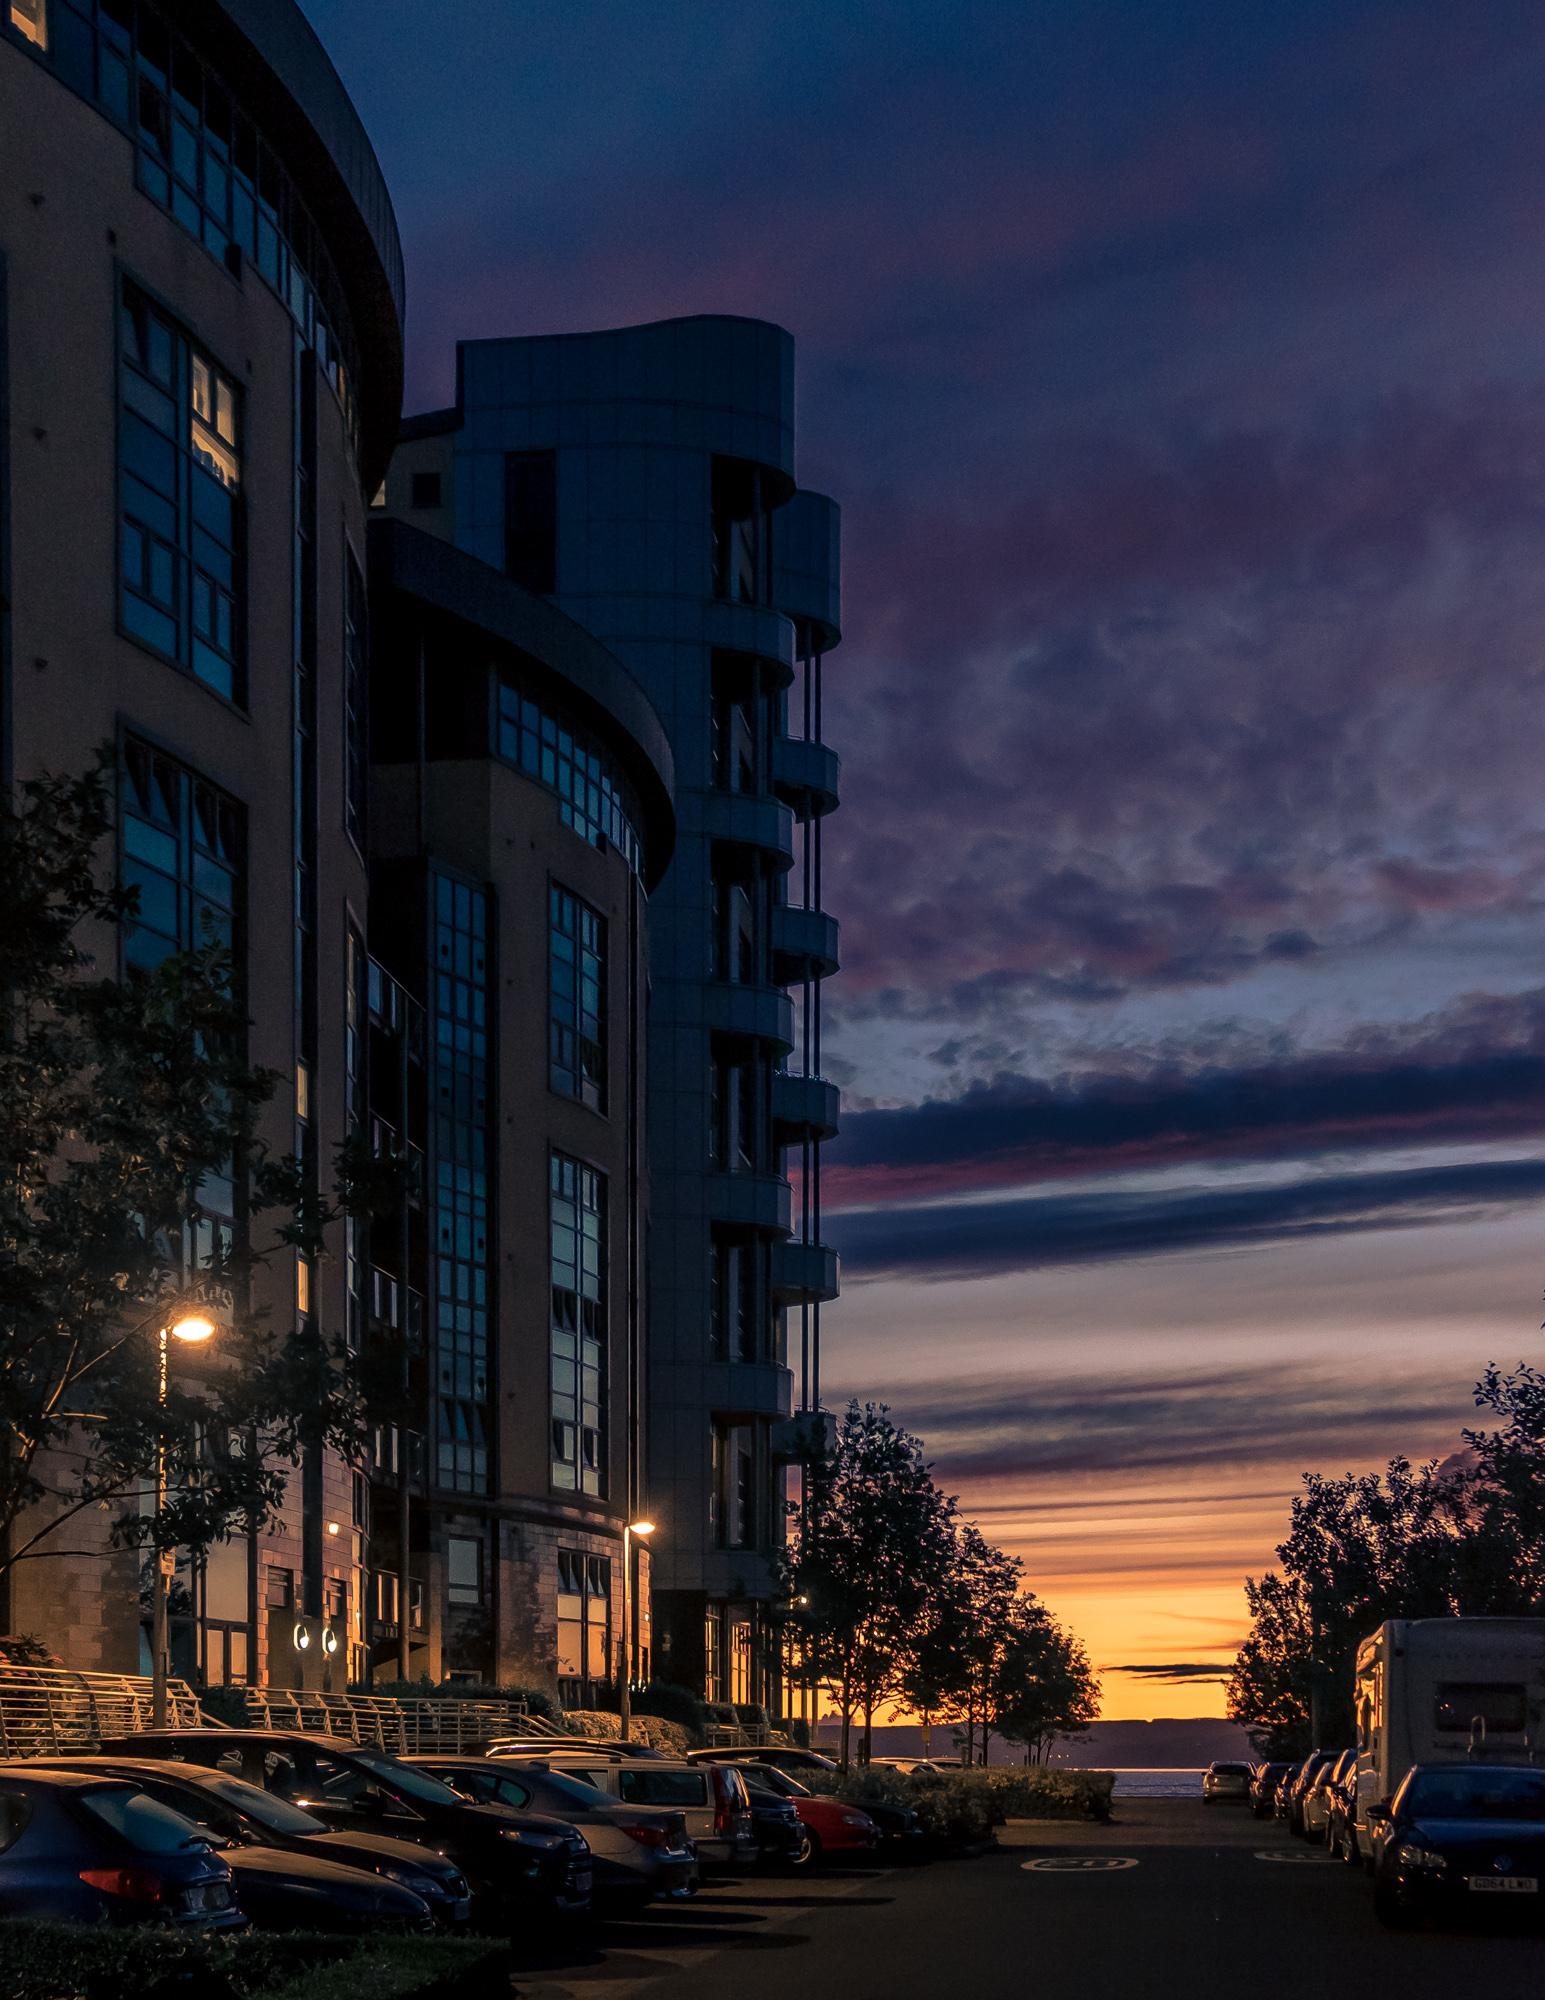 SunsetWstrnHrbr_web-004.jpg